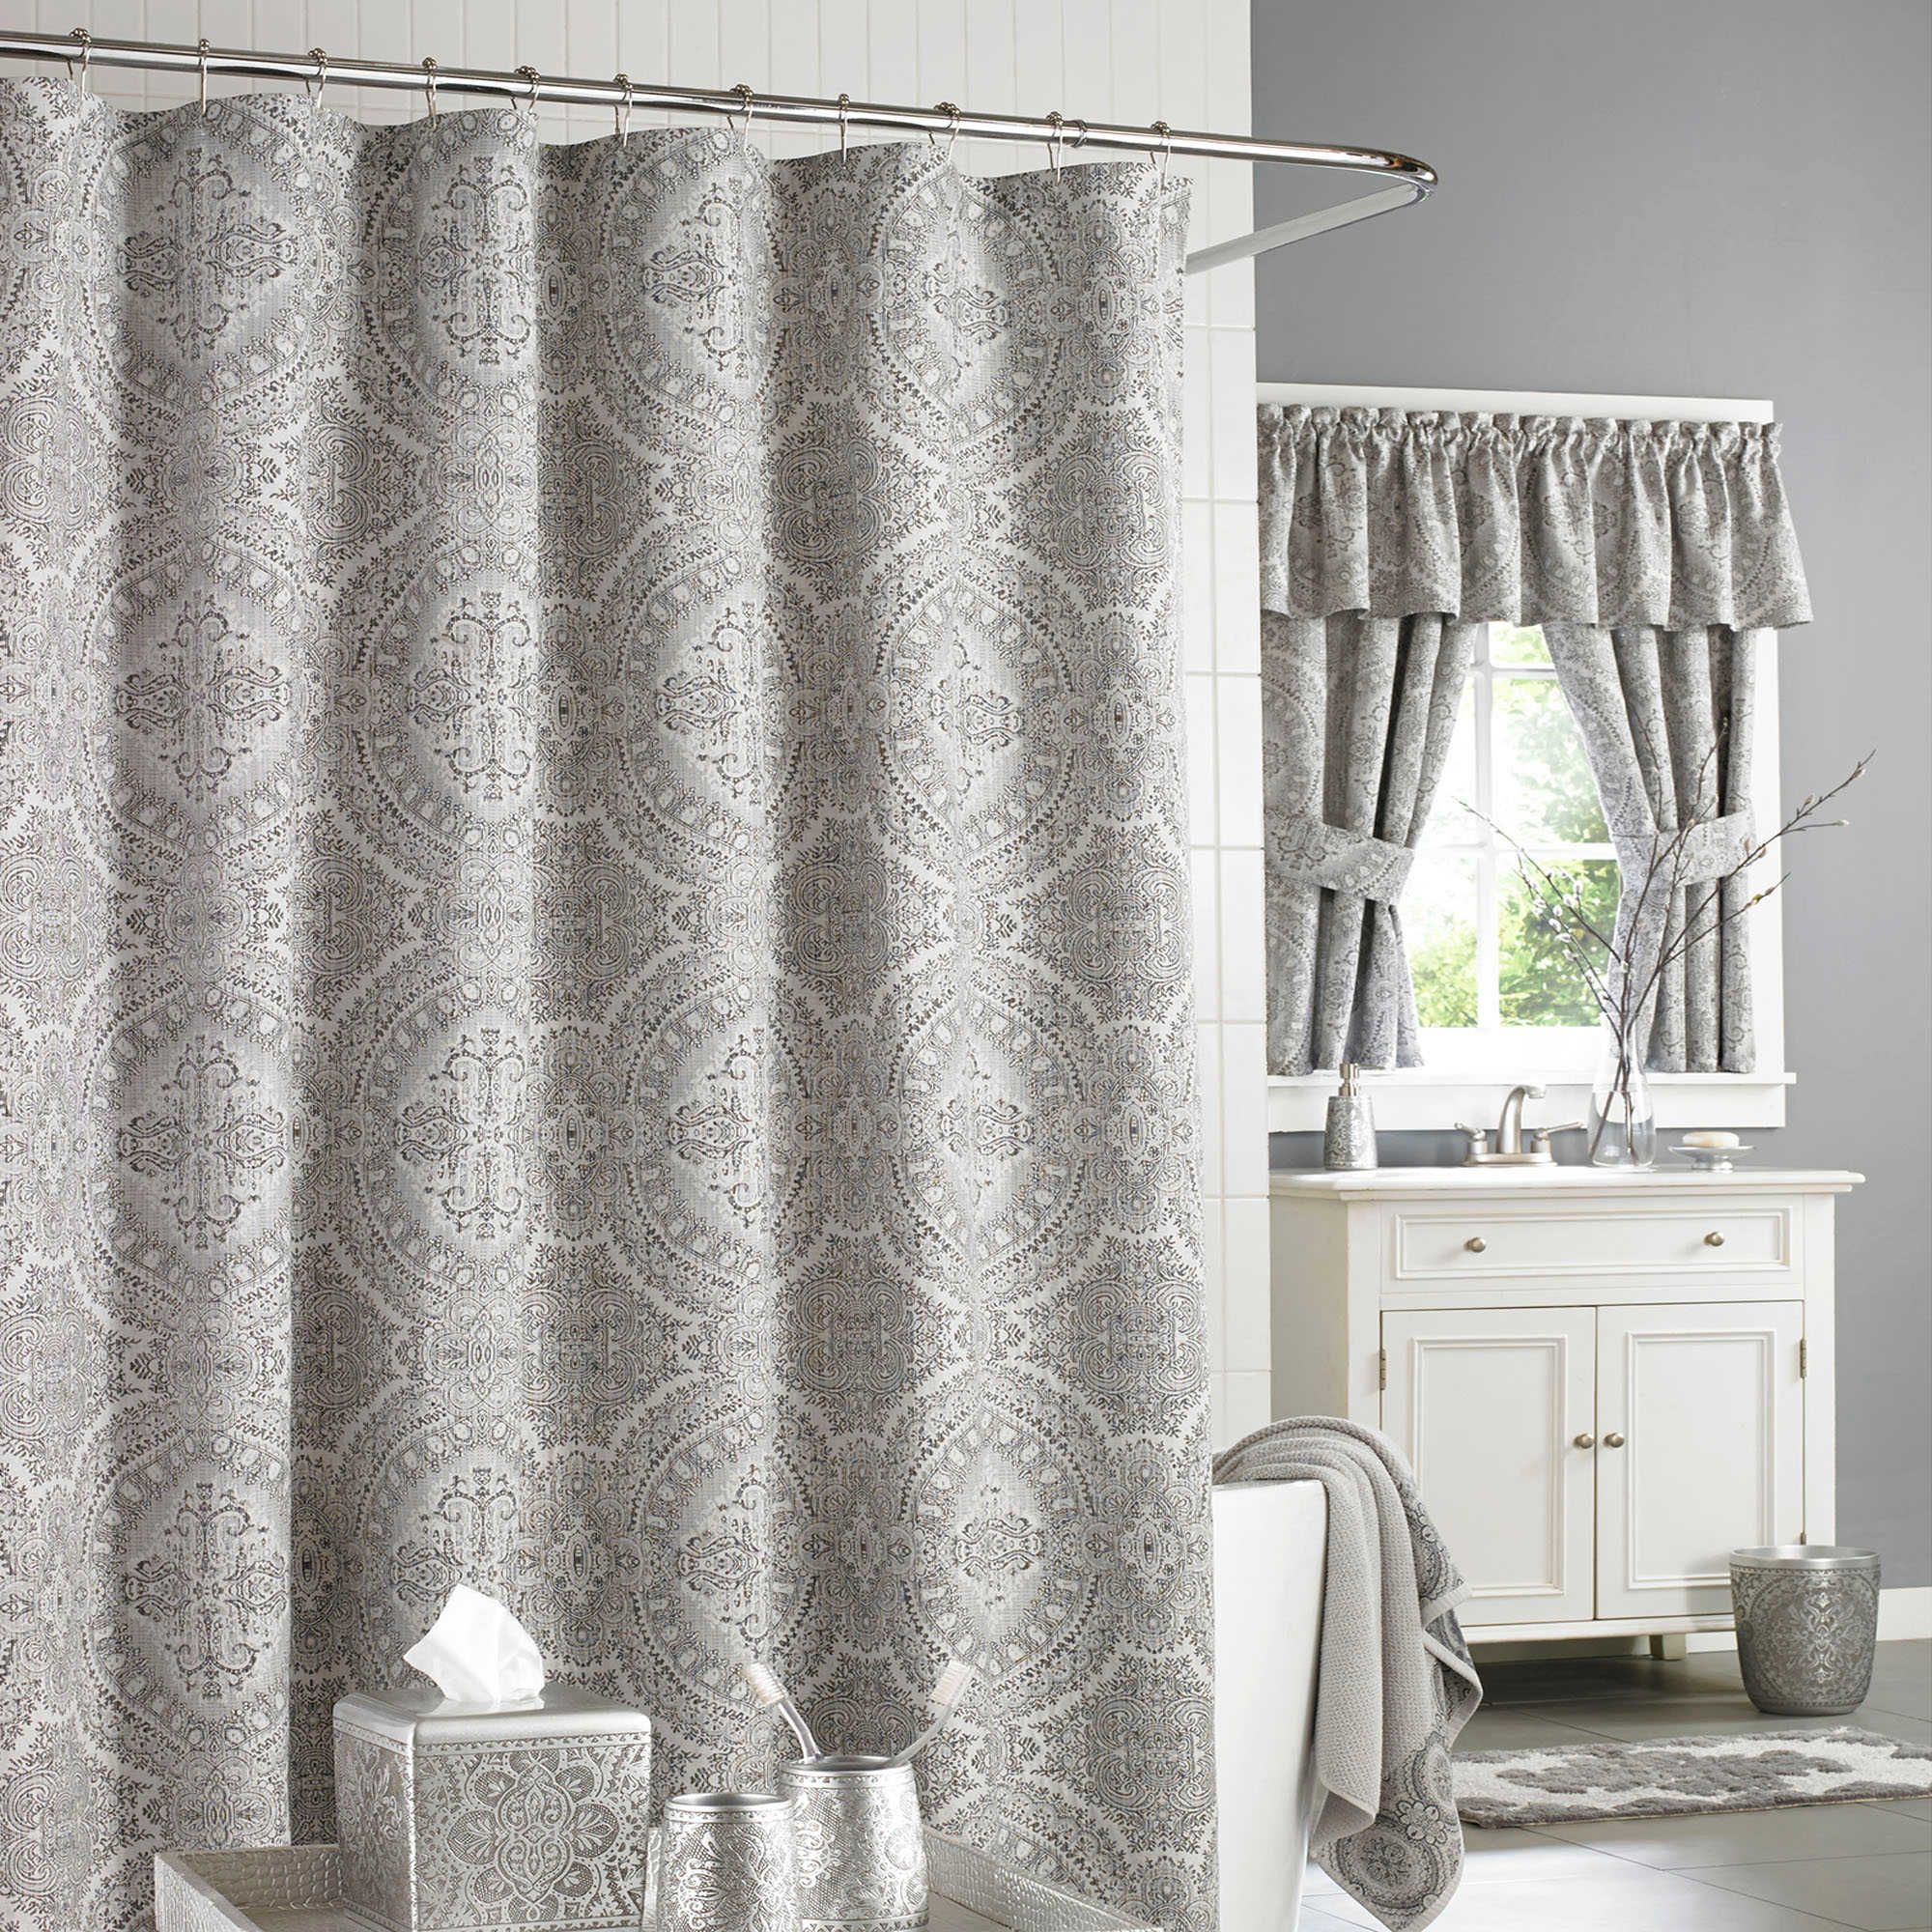 Bed Bath Beyond Shower Curtains Talia 72 Inch X 72 Inch